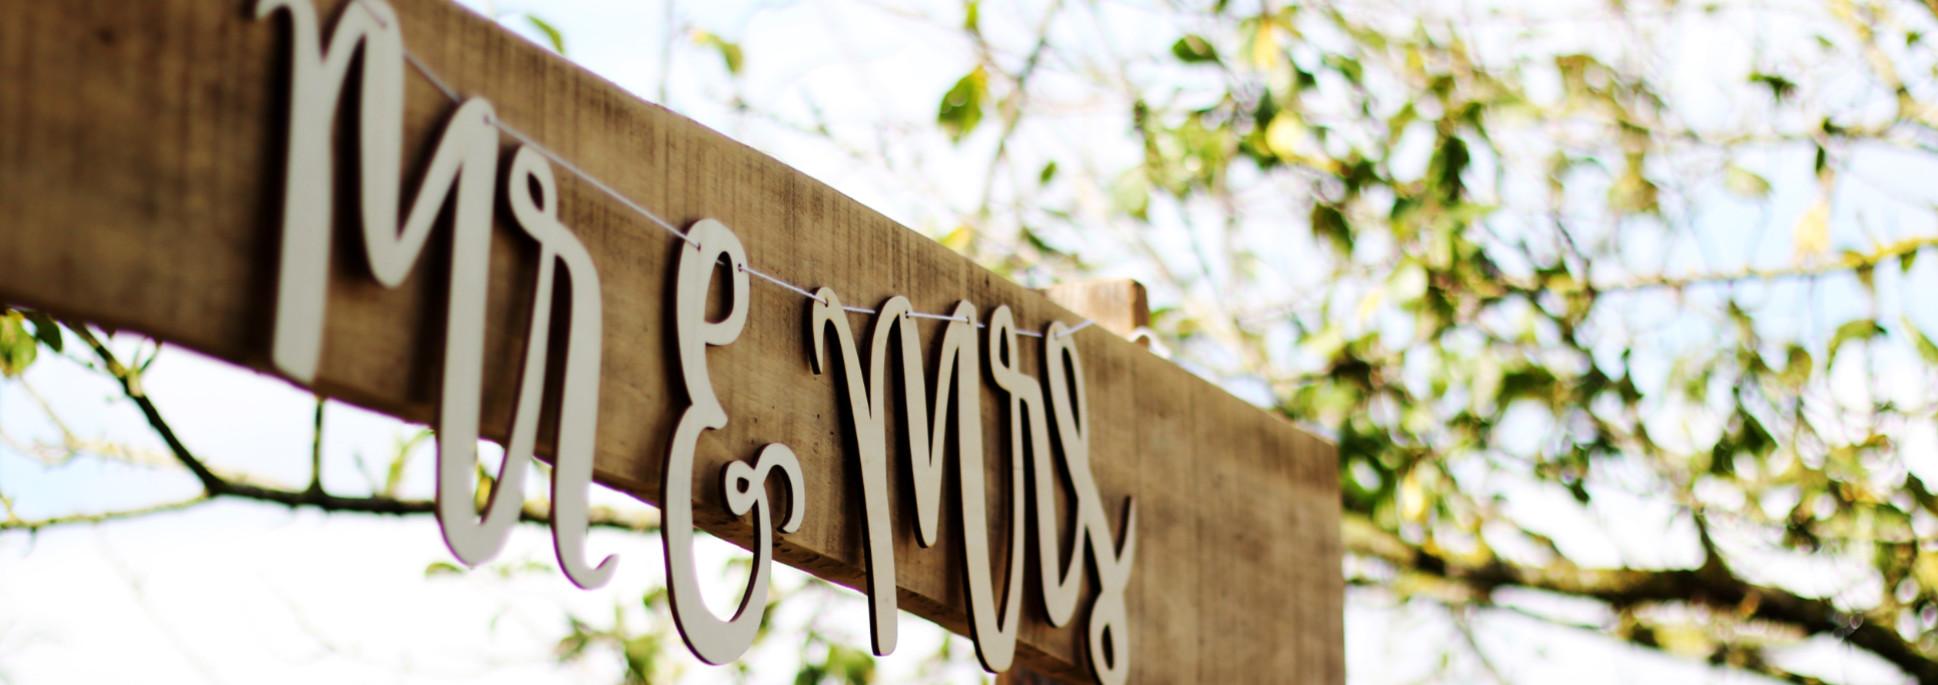 Mr & Mrs wooden wedding hanging sign under trees.